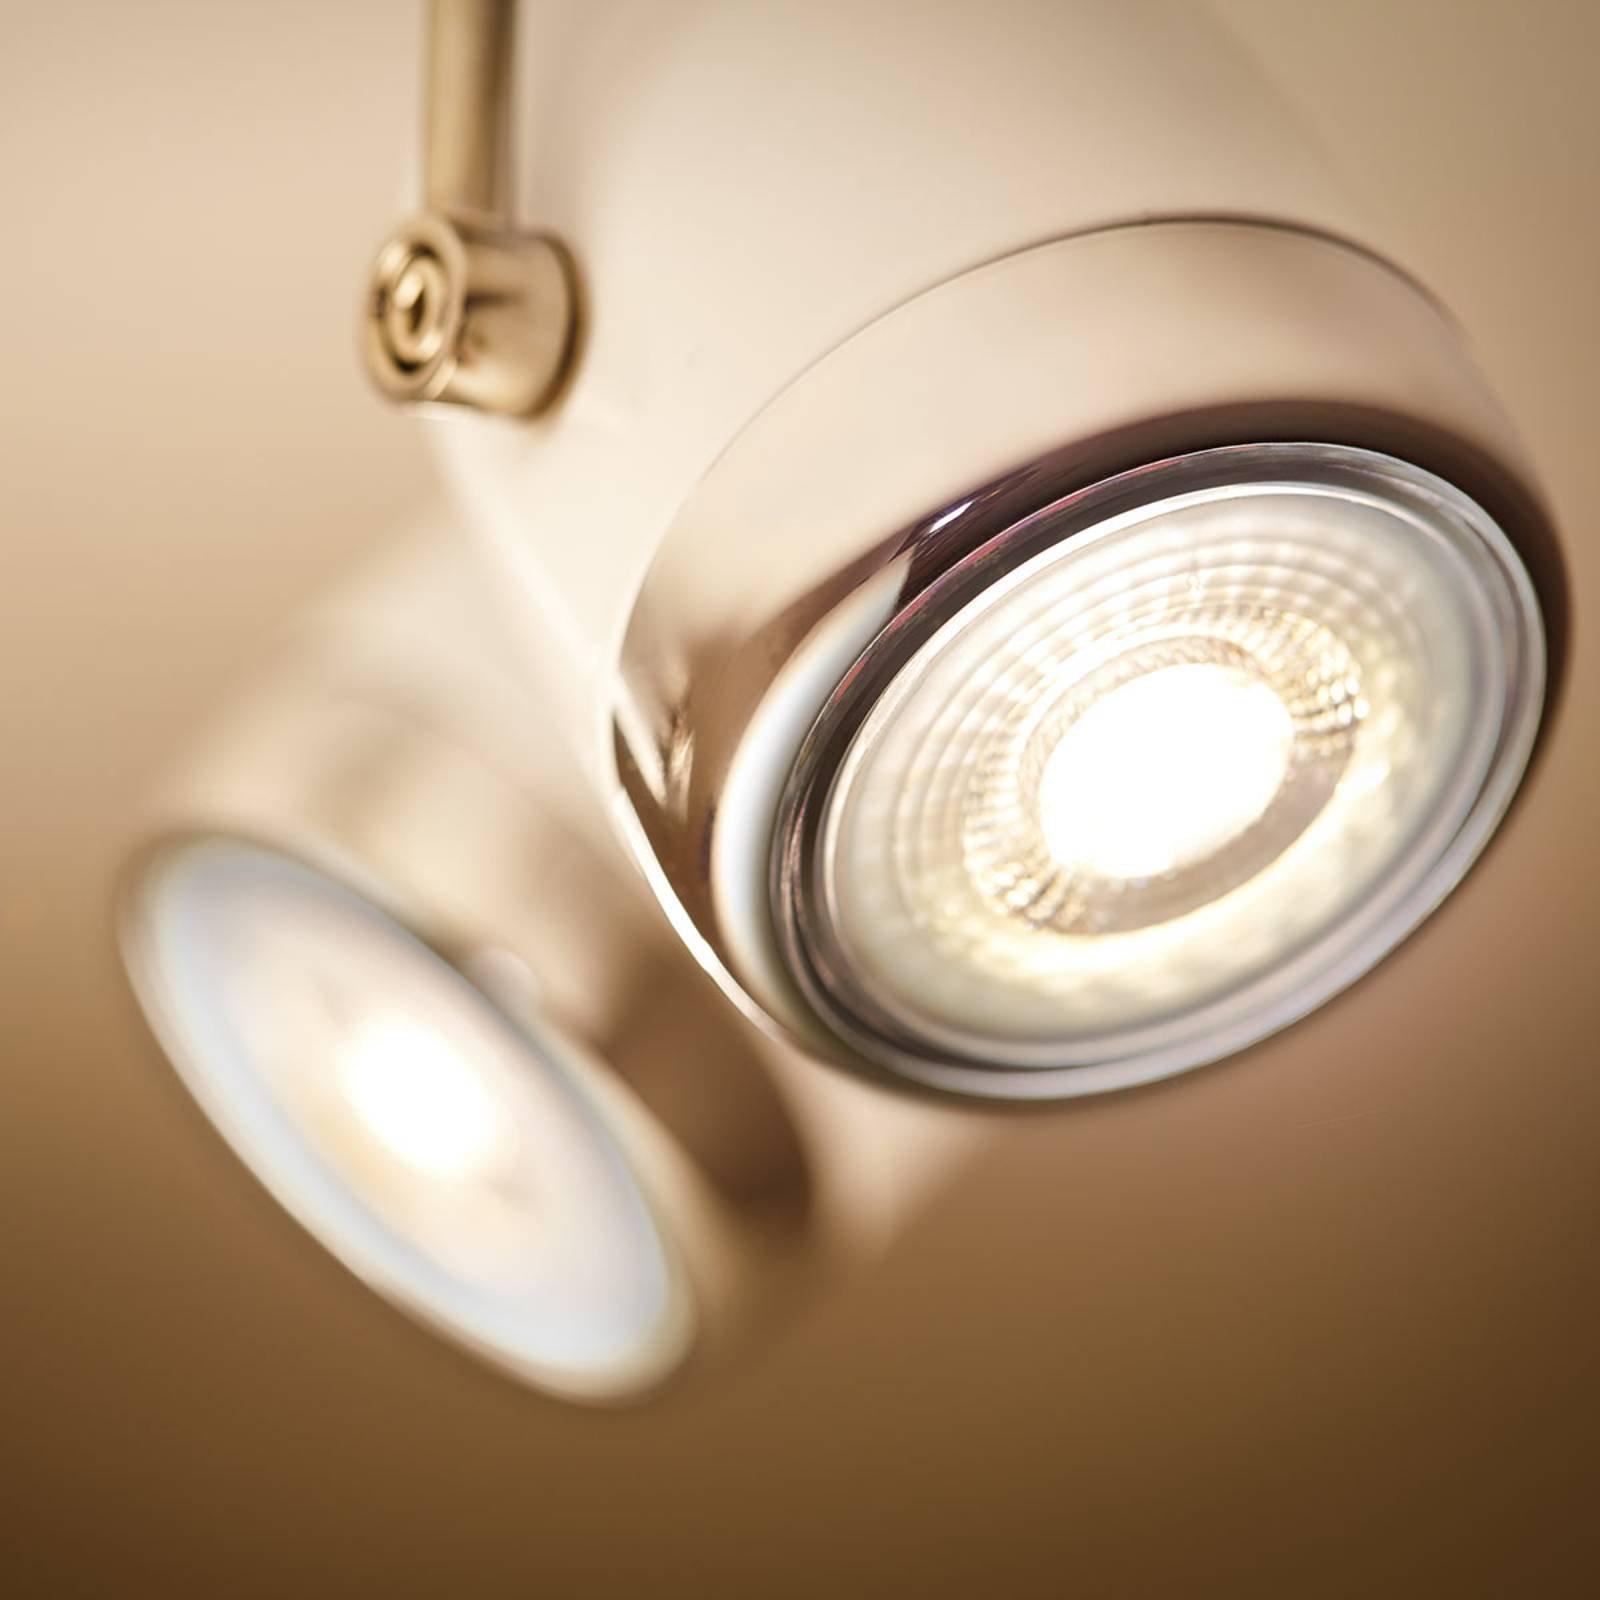 GU5,3 5 W 827 lavvolts LED-reflektor 36° 2 700 K